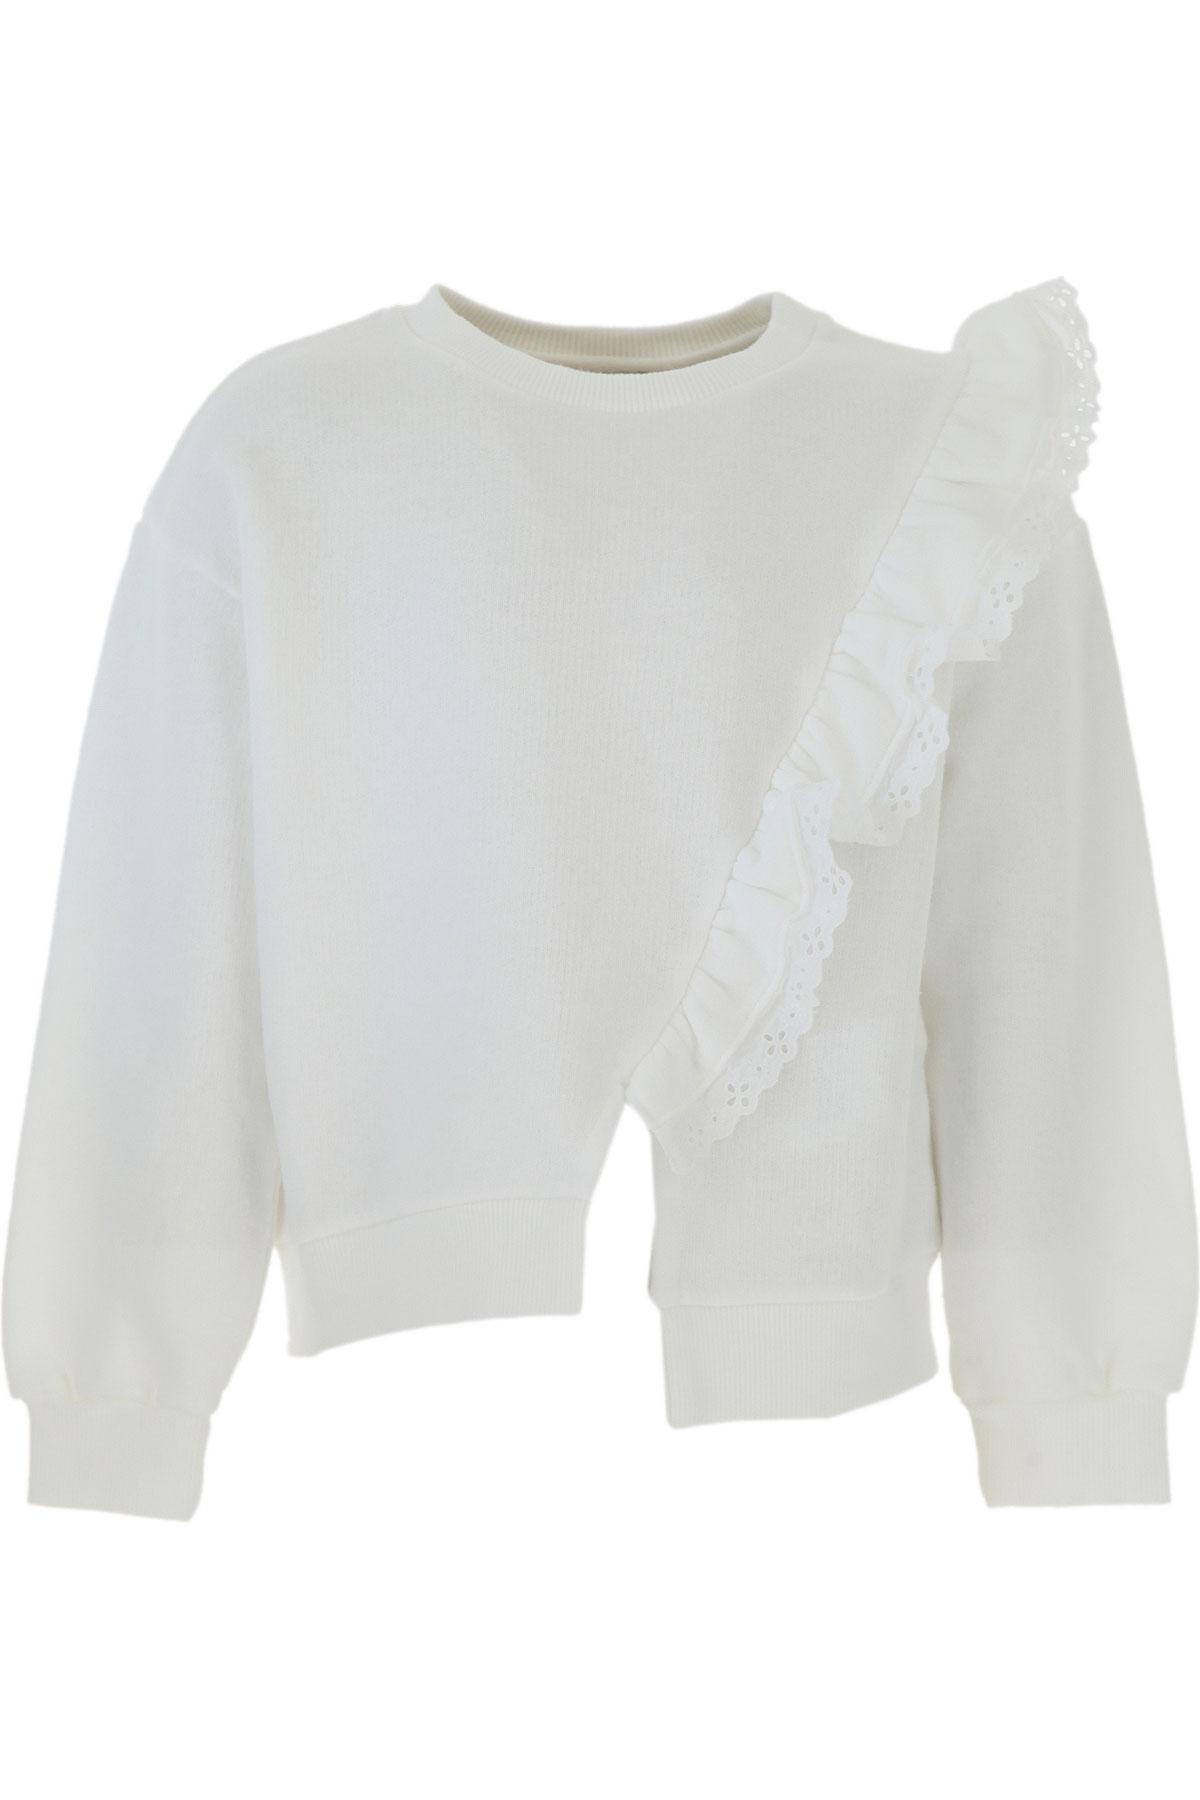 Le Petit Coco Kids Sweatshirts & Hoodies for Girls On Sale, White, Cotton, 2019, 10Y 3Y 4Y 6Y